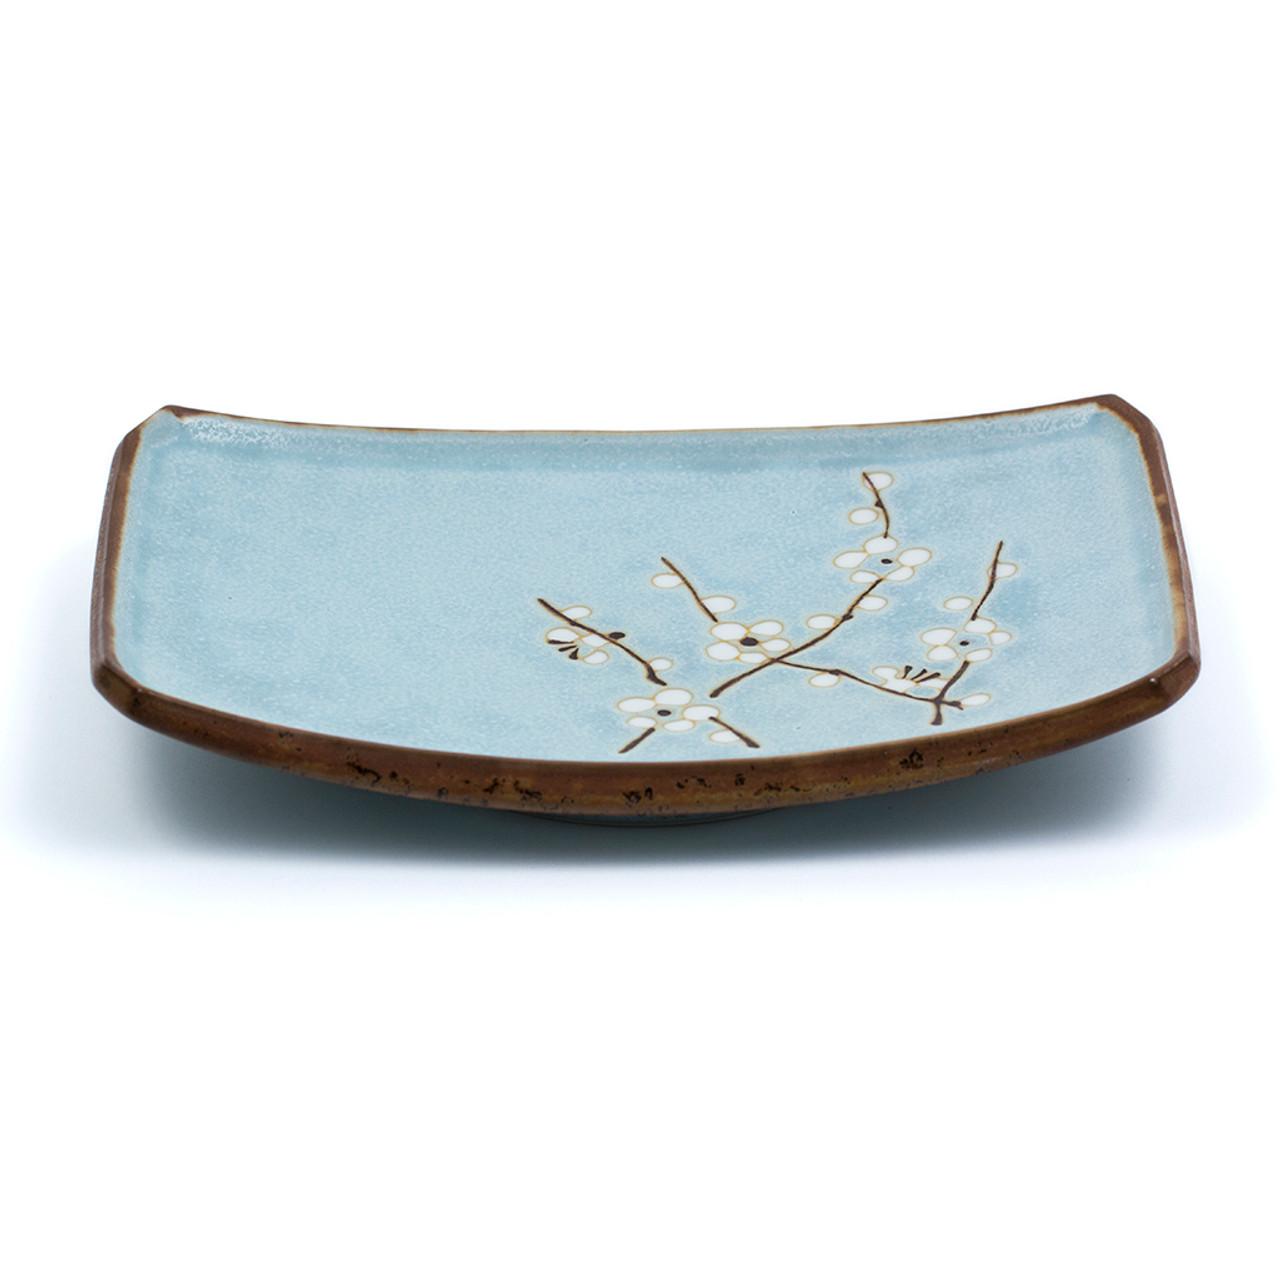 Plum Design Blue Plate